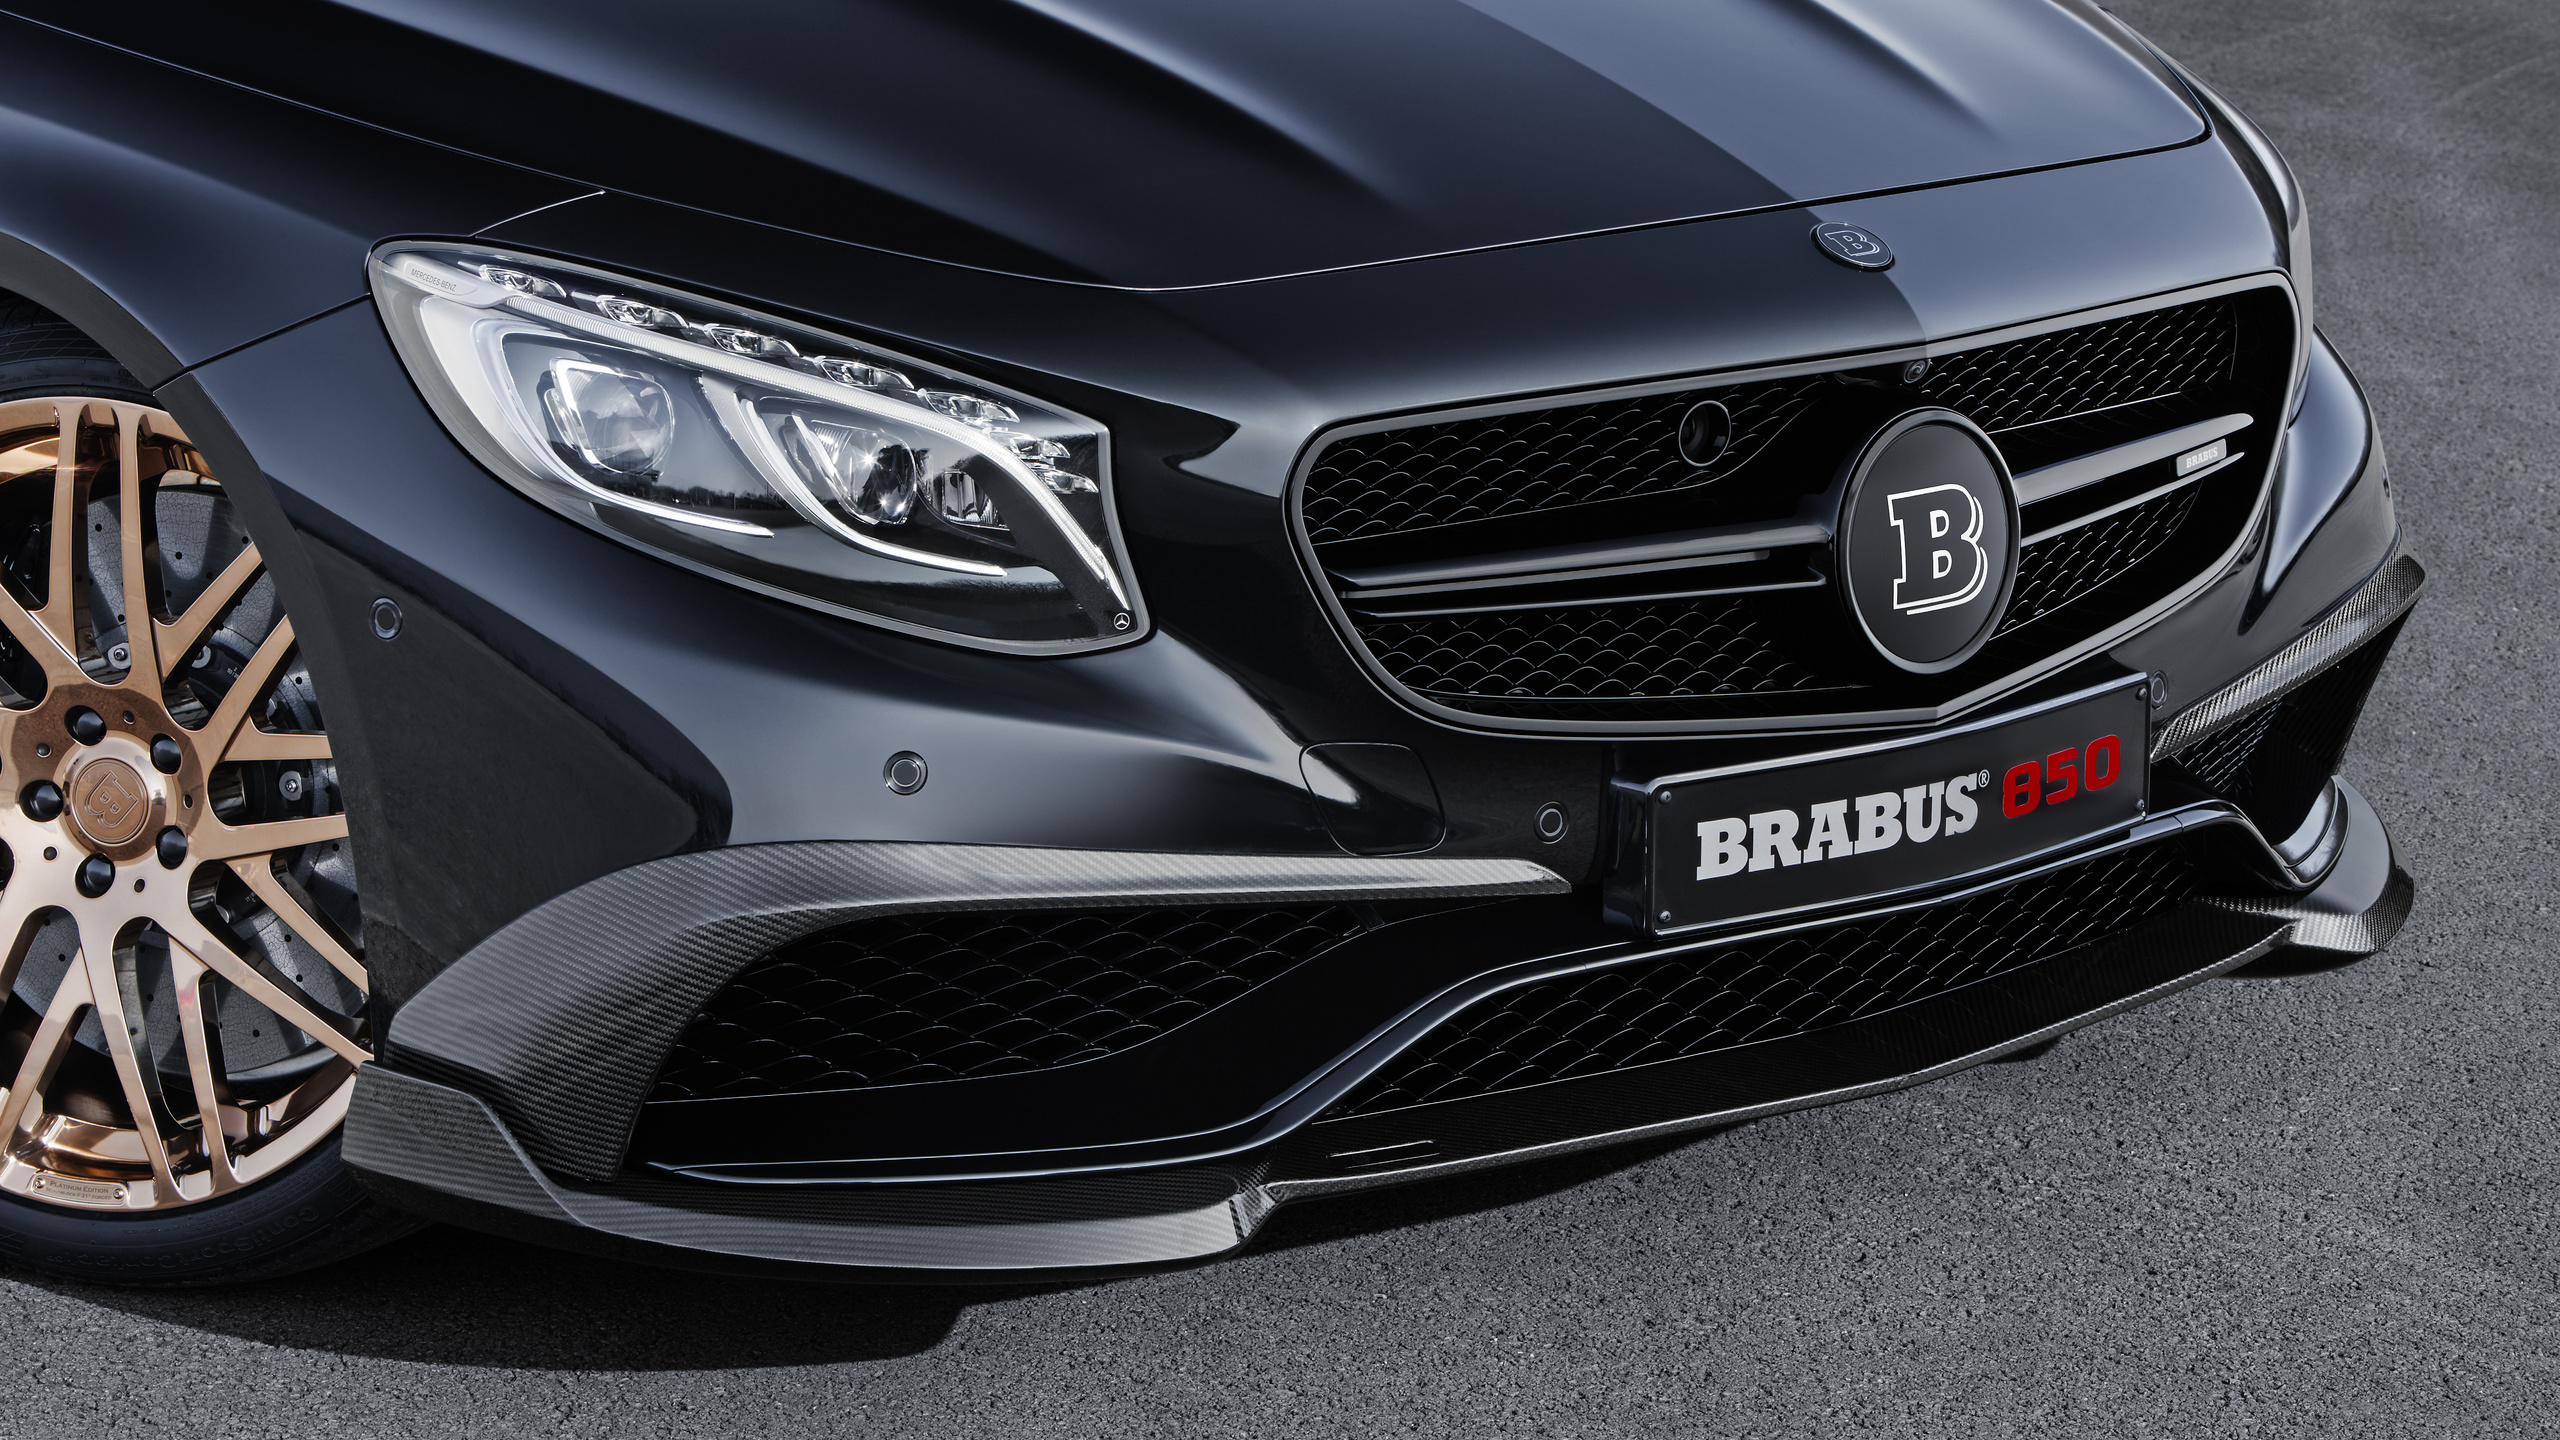 автомобиль, brabus, 850, biturbo, coupe